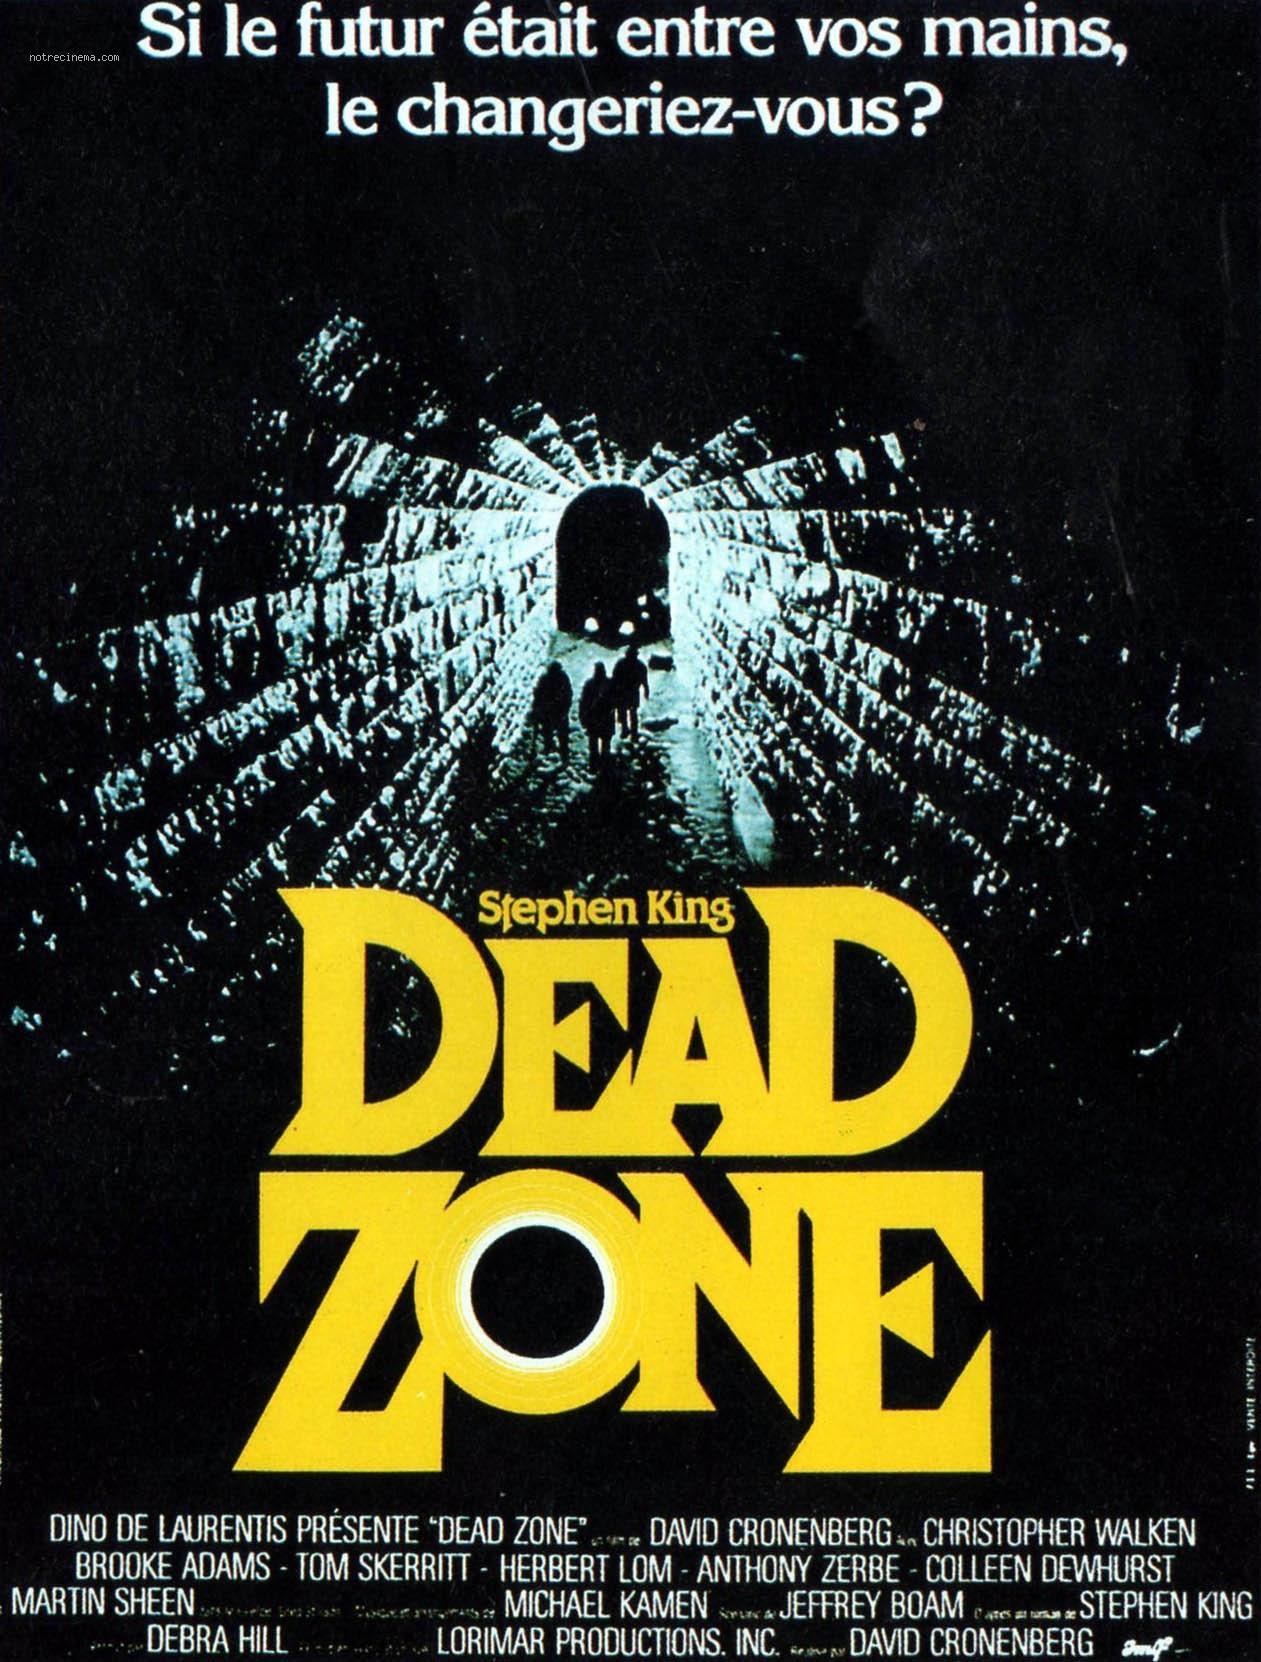 dead-zone-affiche_479955_29529.jpg